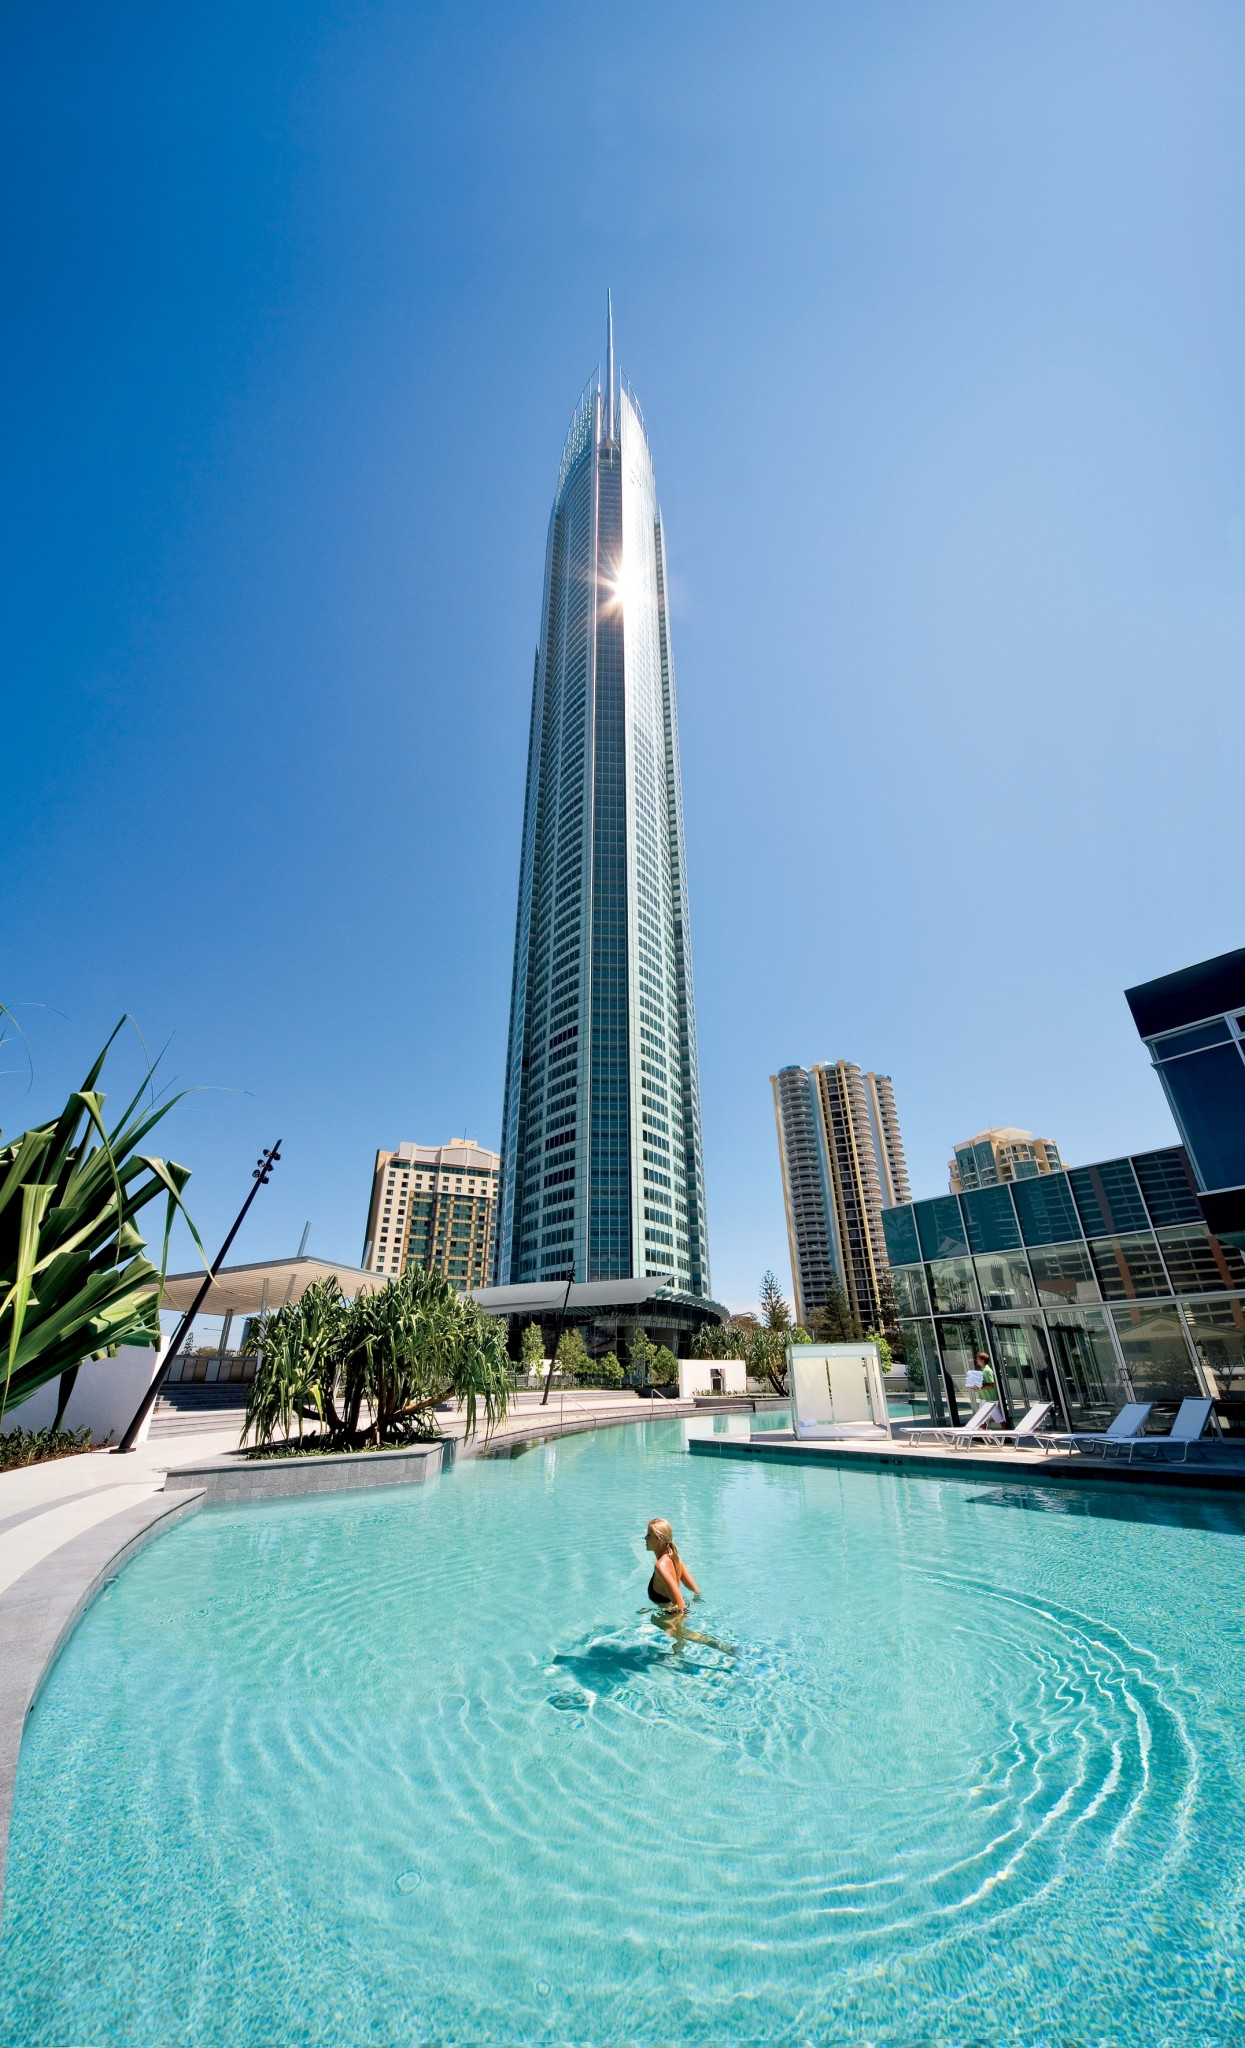 Q1 Resort & Spa Gold Coast